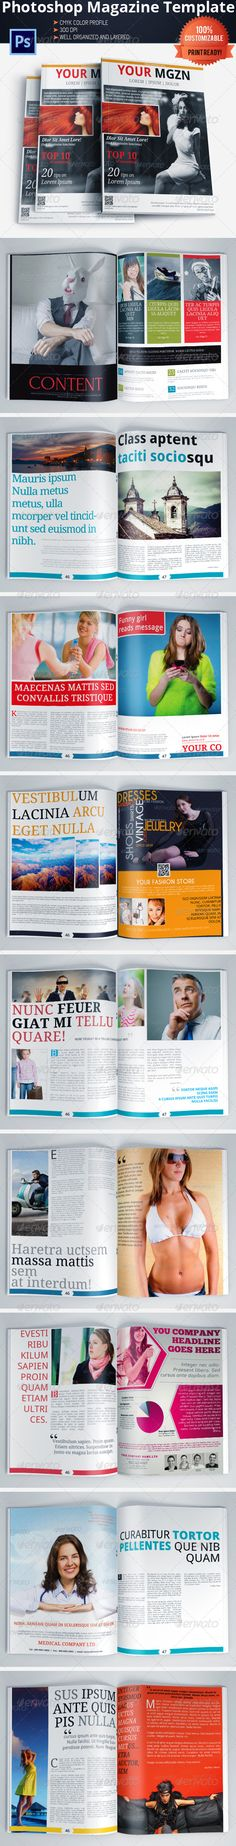 #Multipurpose #Magazine Template (Photoshop PSD) - Magazines Print Templates Download here: https://graphicriver.net/item/multipurpose-magazine-template-photoshop-psd/6016682?ref=alena994